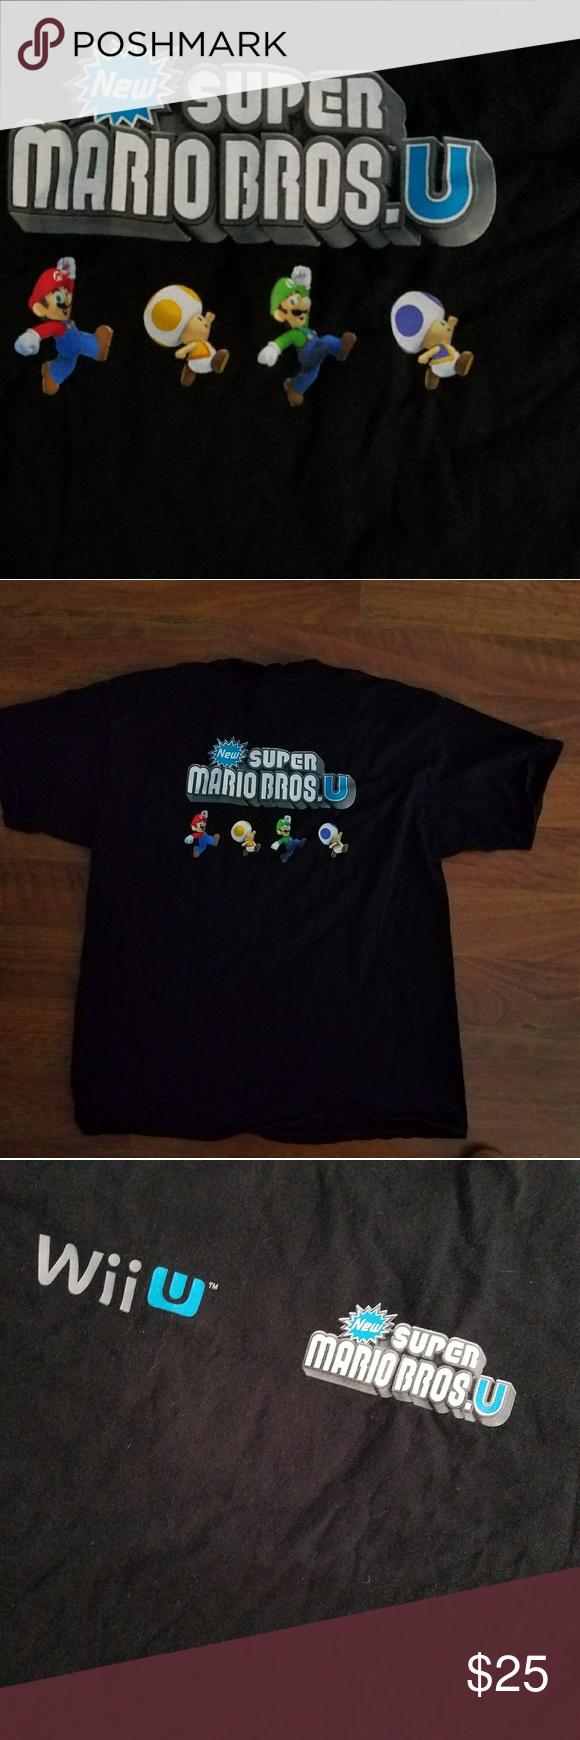 Black t shirt xl - Black T Shirt Size Xl Nerd This Is An Awesome